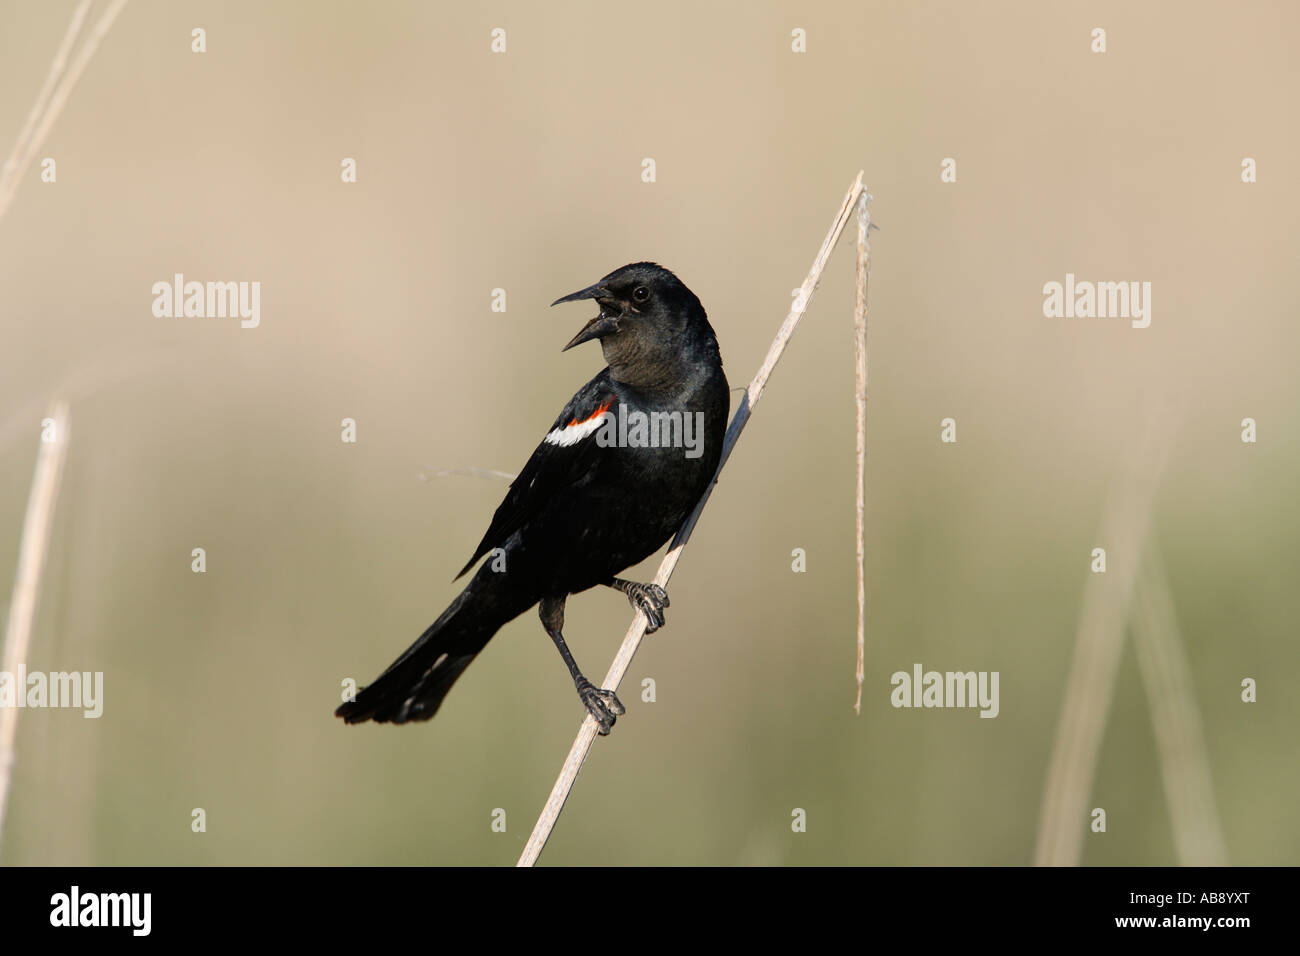 Tricolored Blackbird Singing - Stock Image